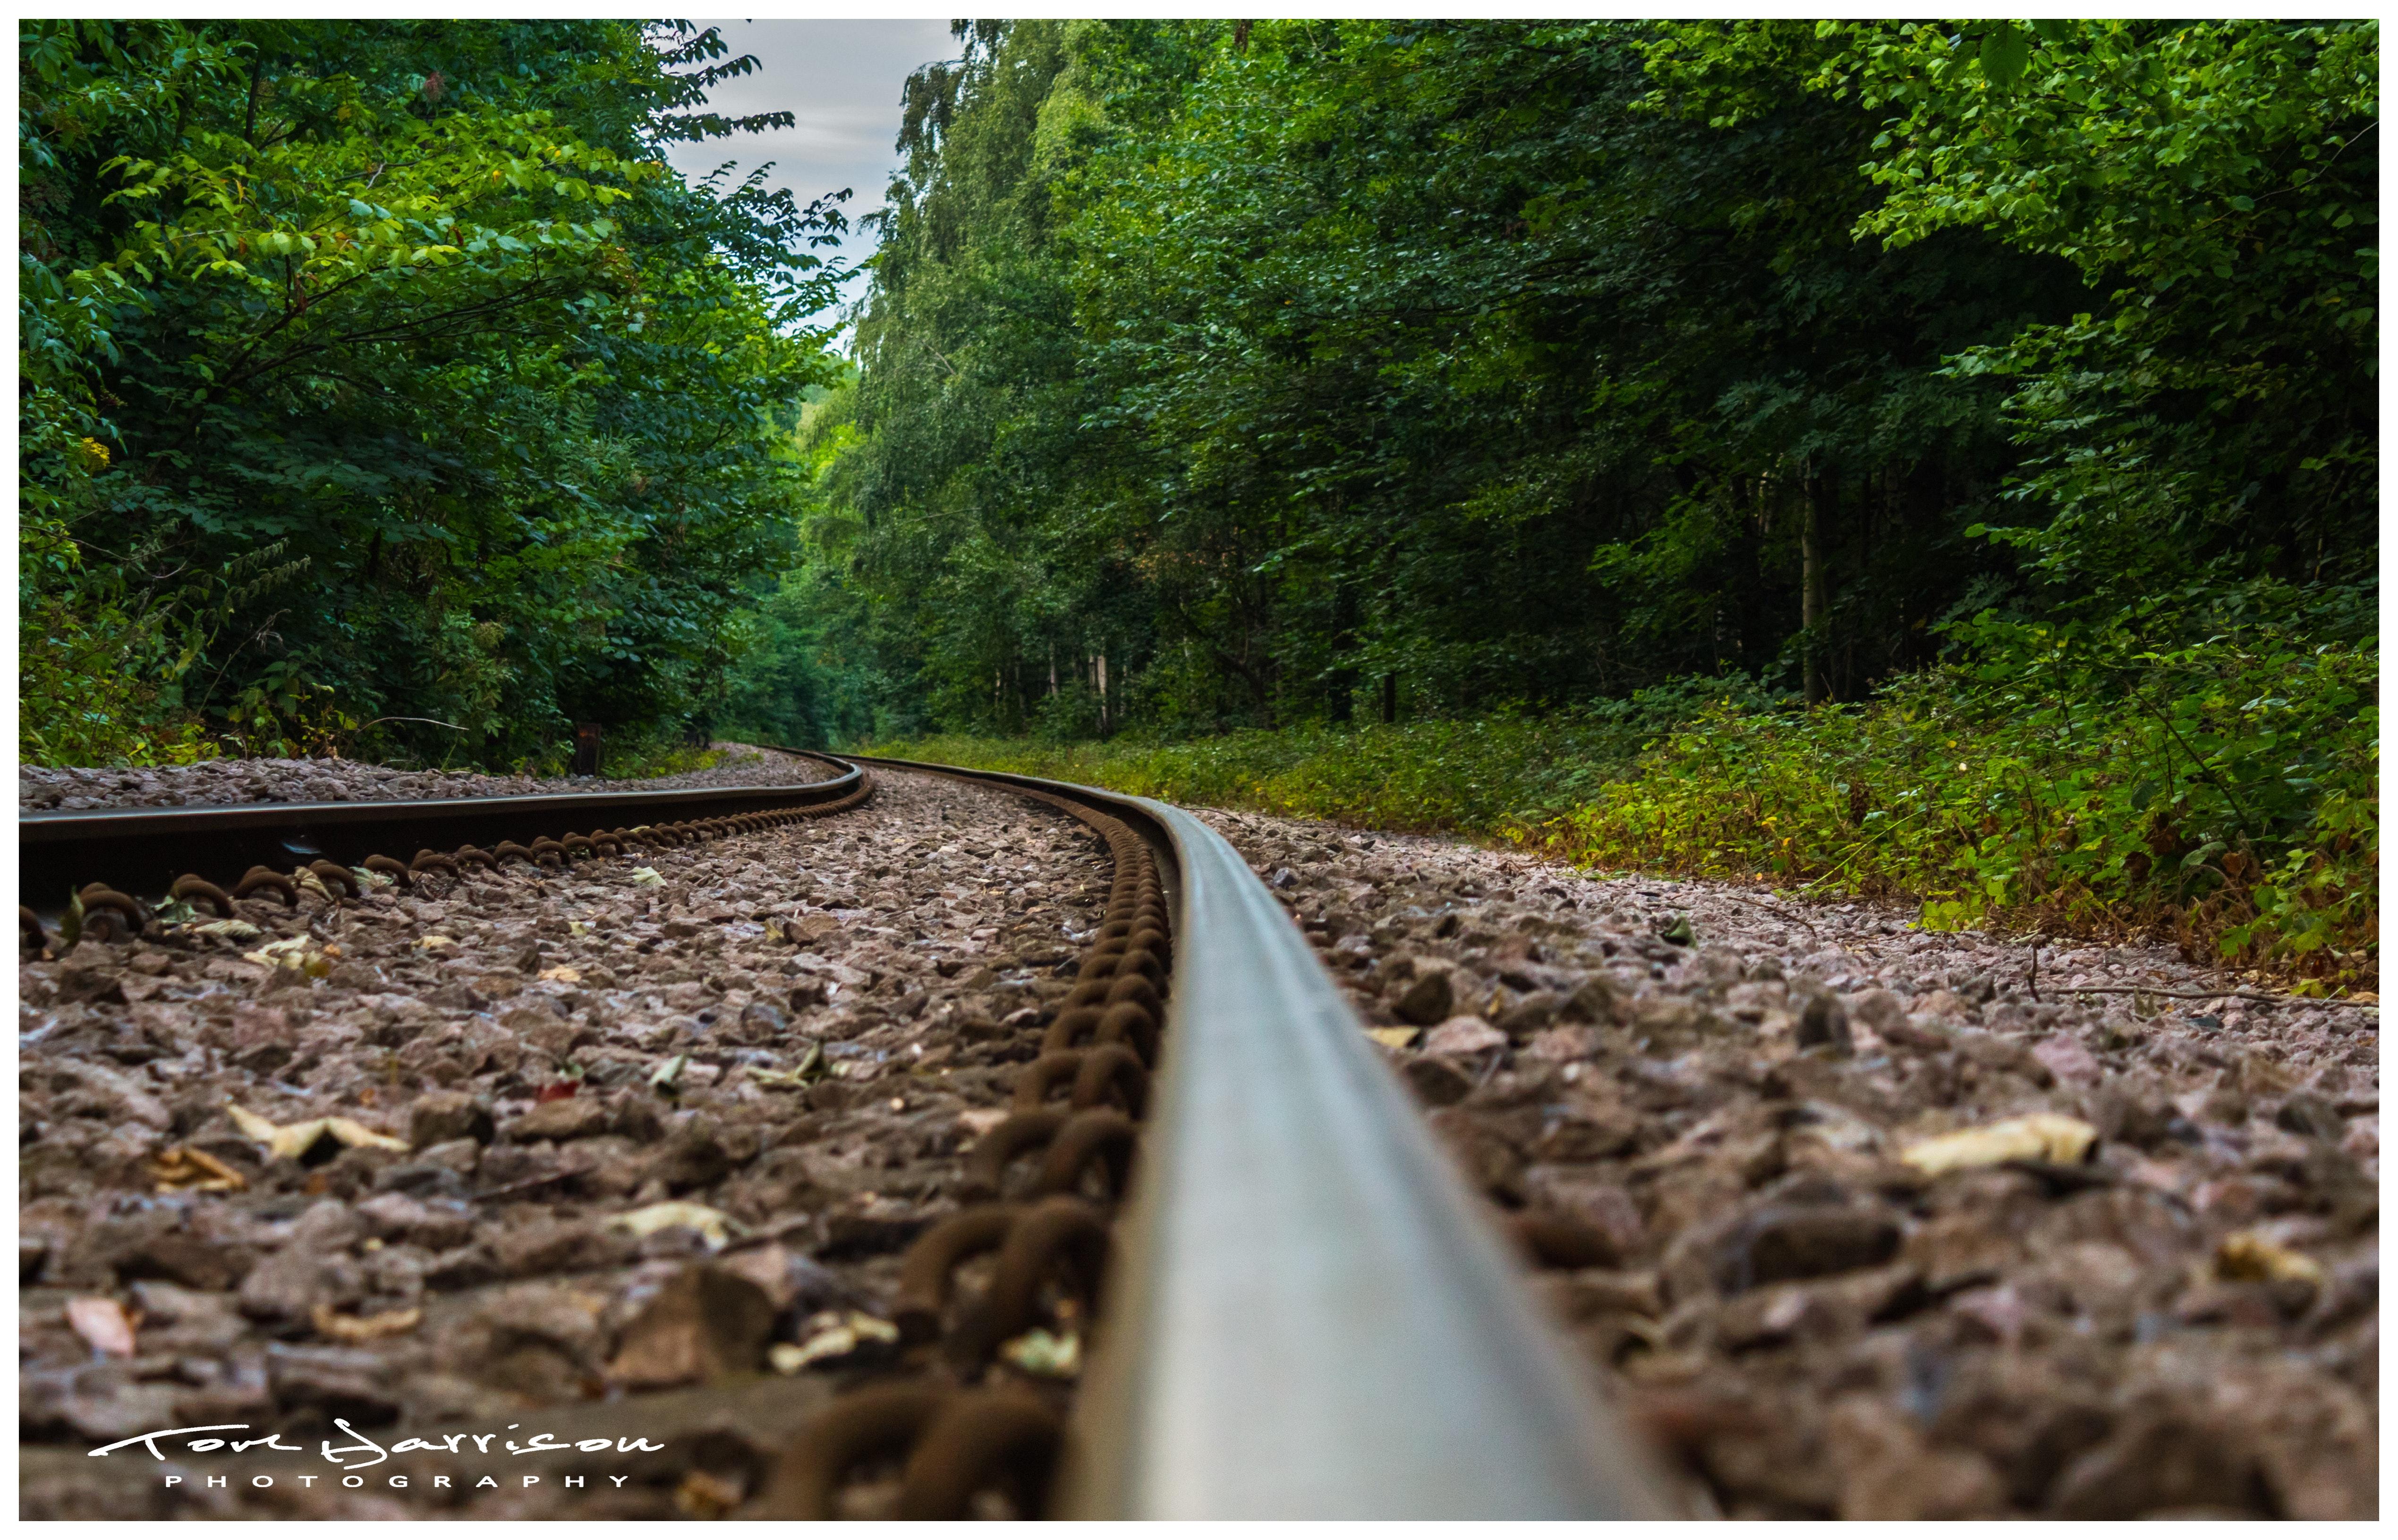 Free stock photo of carved wood, rail road, train tracks